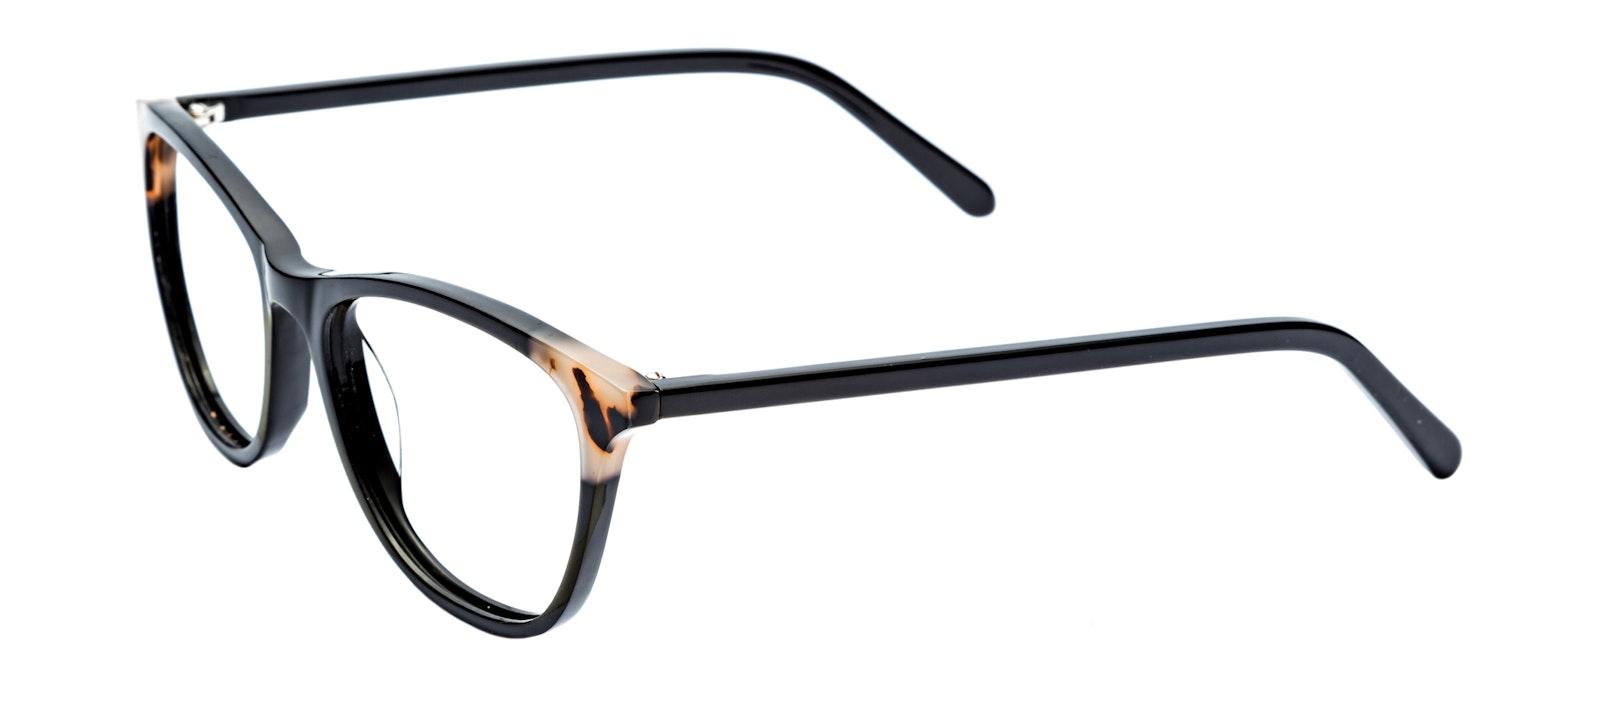 Affordable Fashion Glasses Rectangle Eyeglasses Women Folk Ebony Granite Tilt